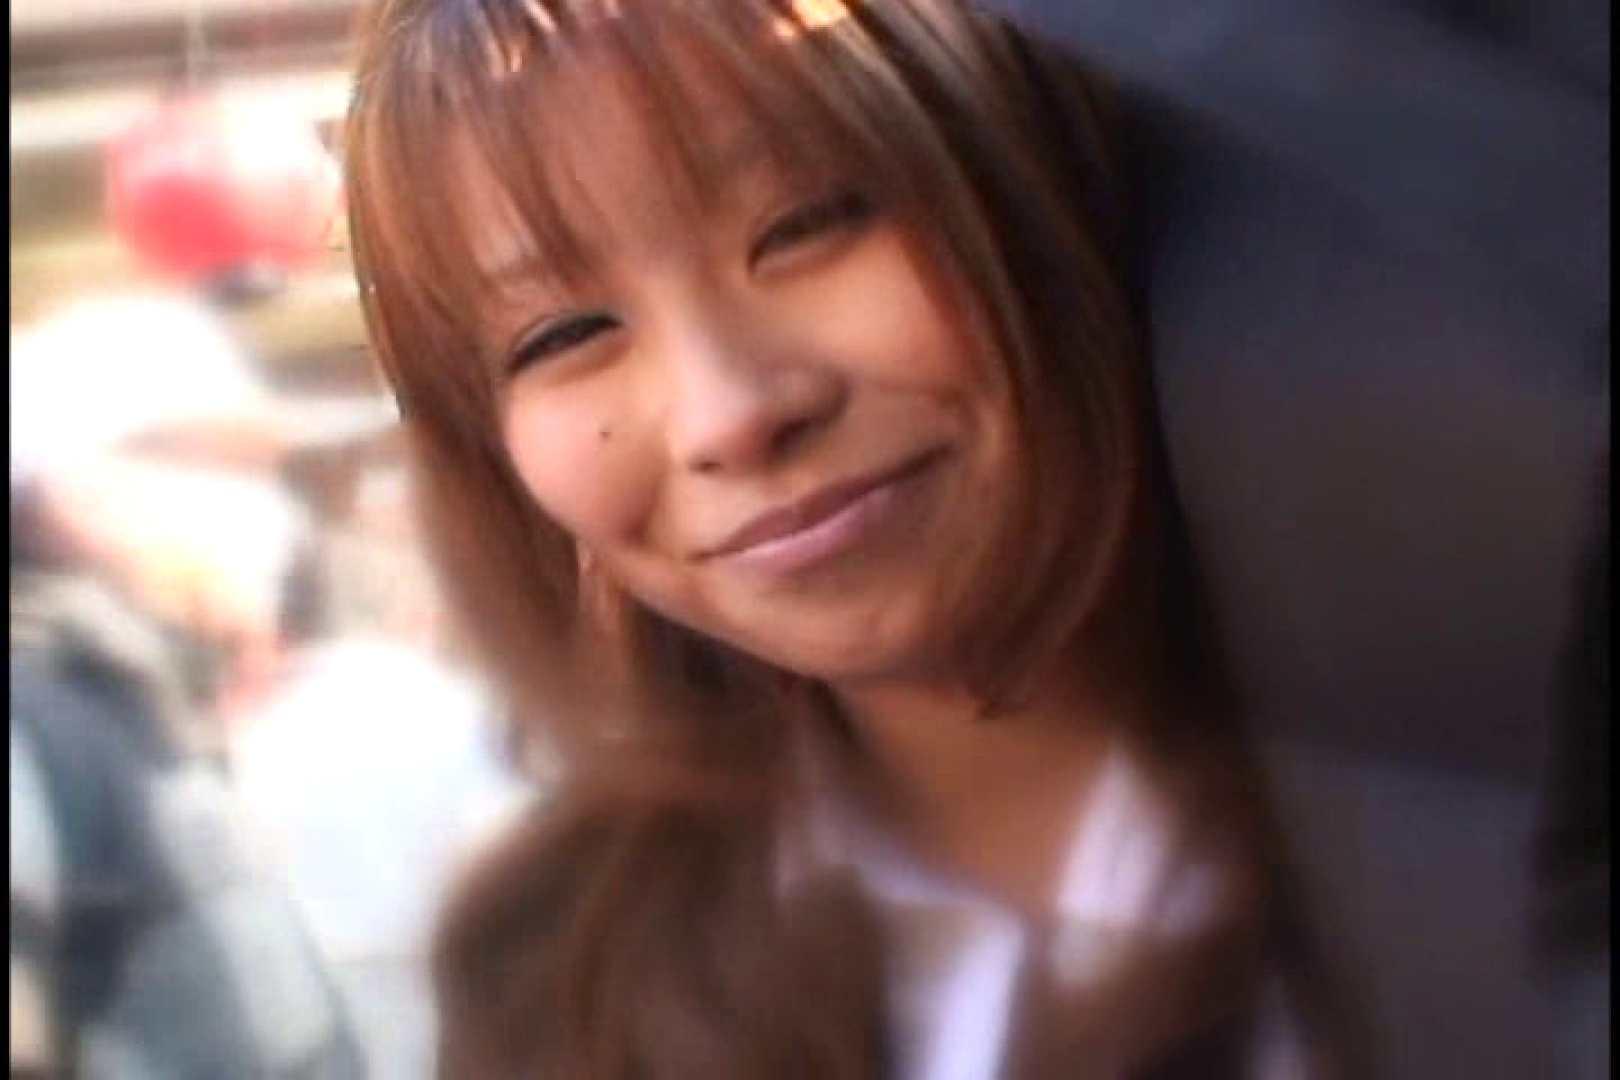 JDハンター全国ツアー vol.014 前編 女子大生丸裸  84pic 14